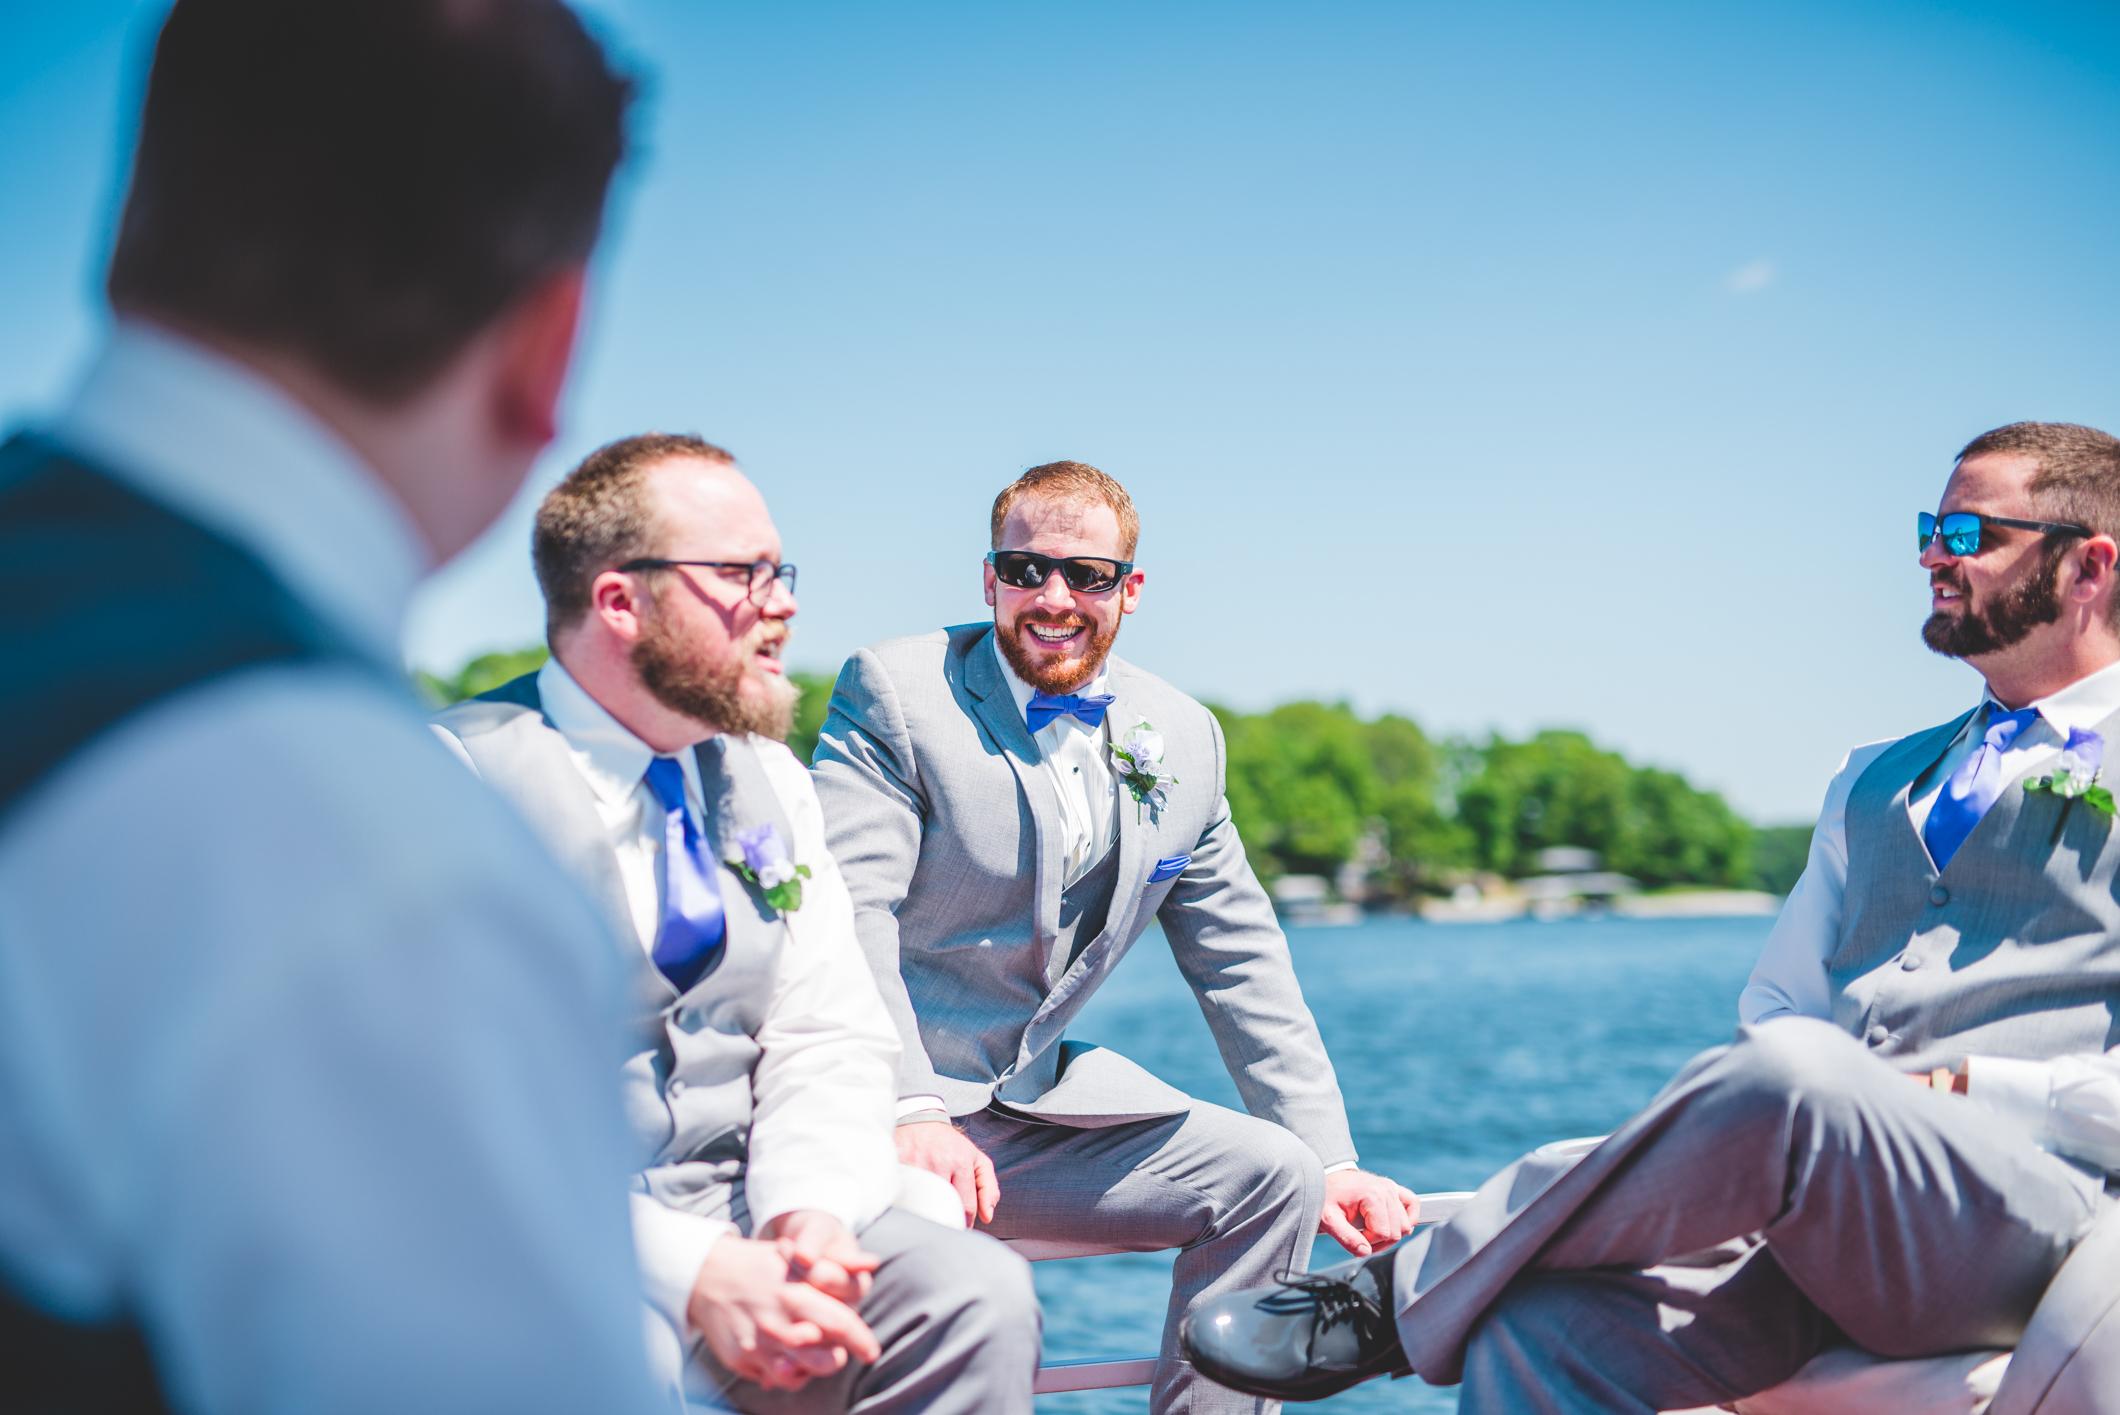 Casey & CJ Wedding - Preview - Creative Cure Weddings-3.jpg